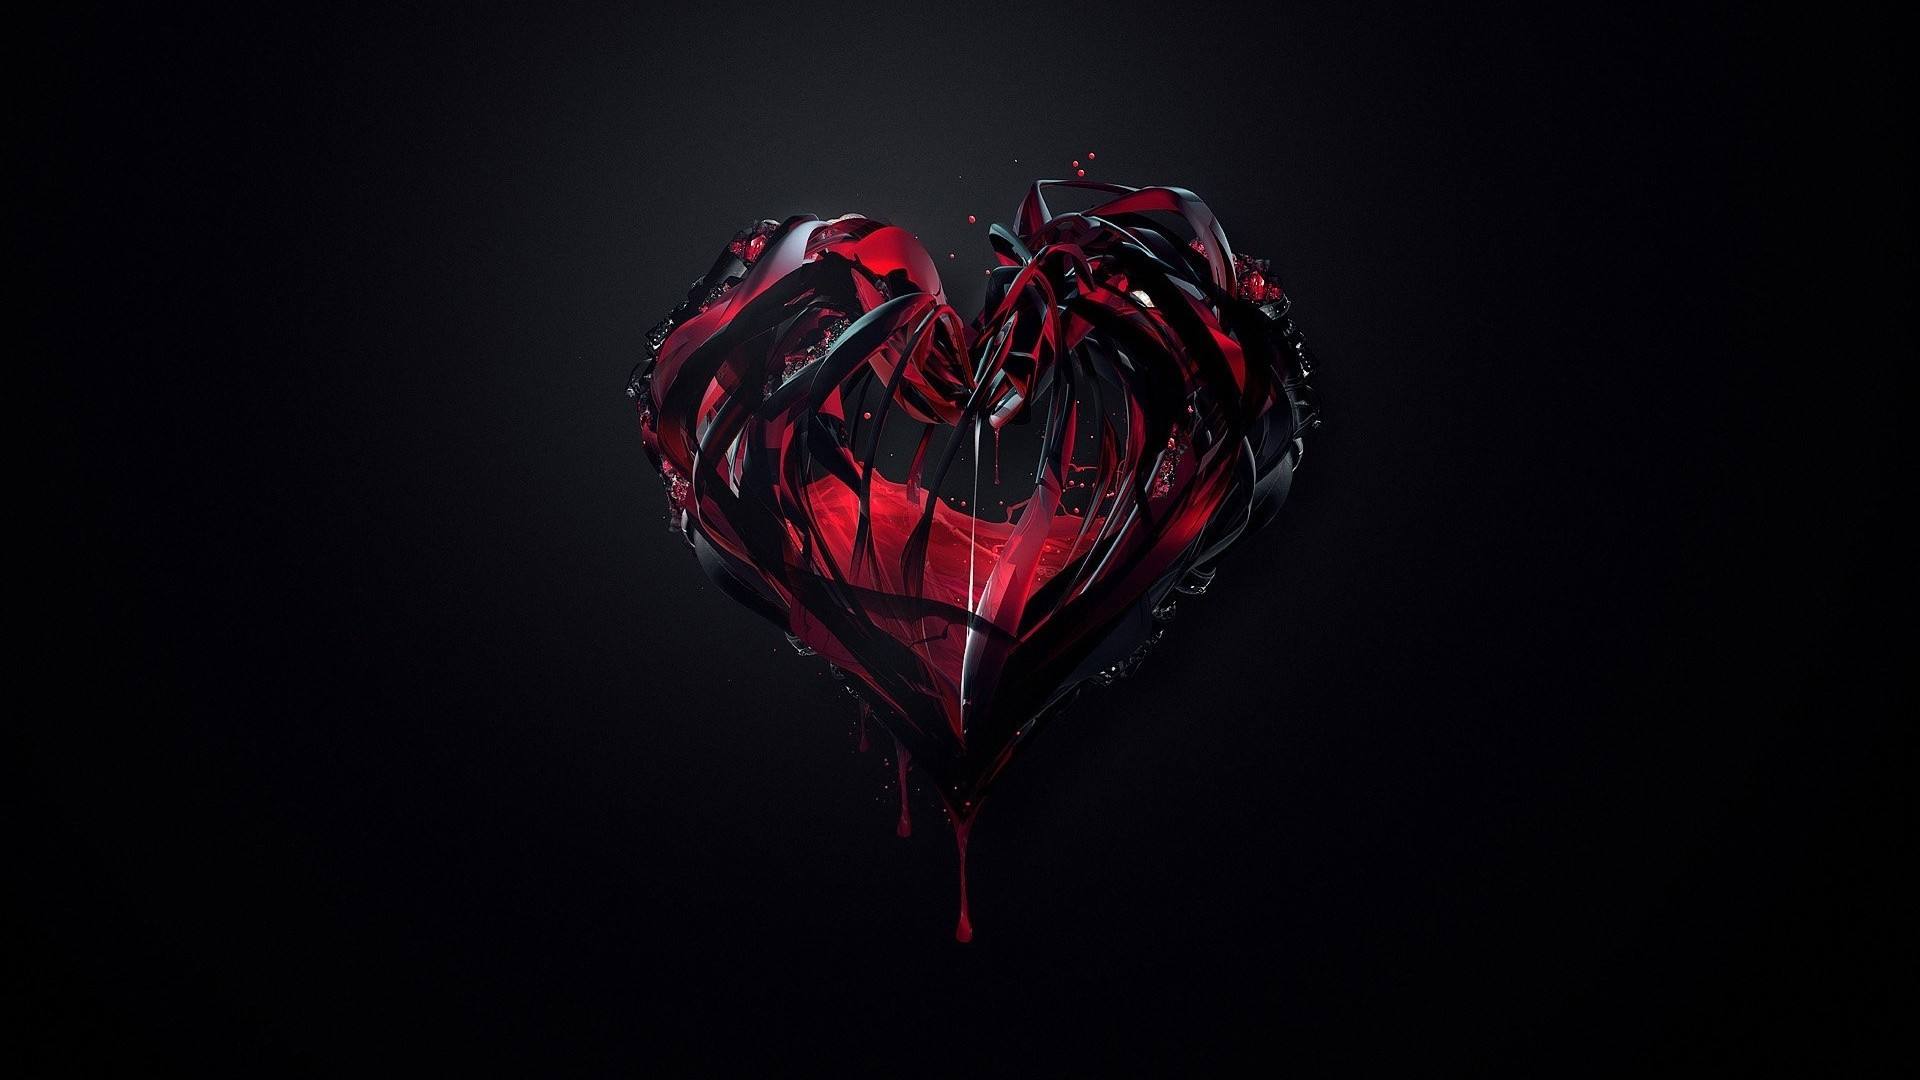 Broken Heart Wallpaper and Background